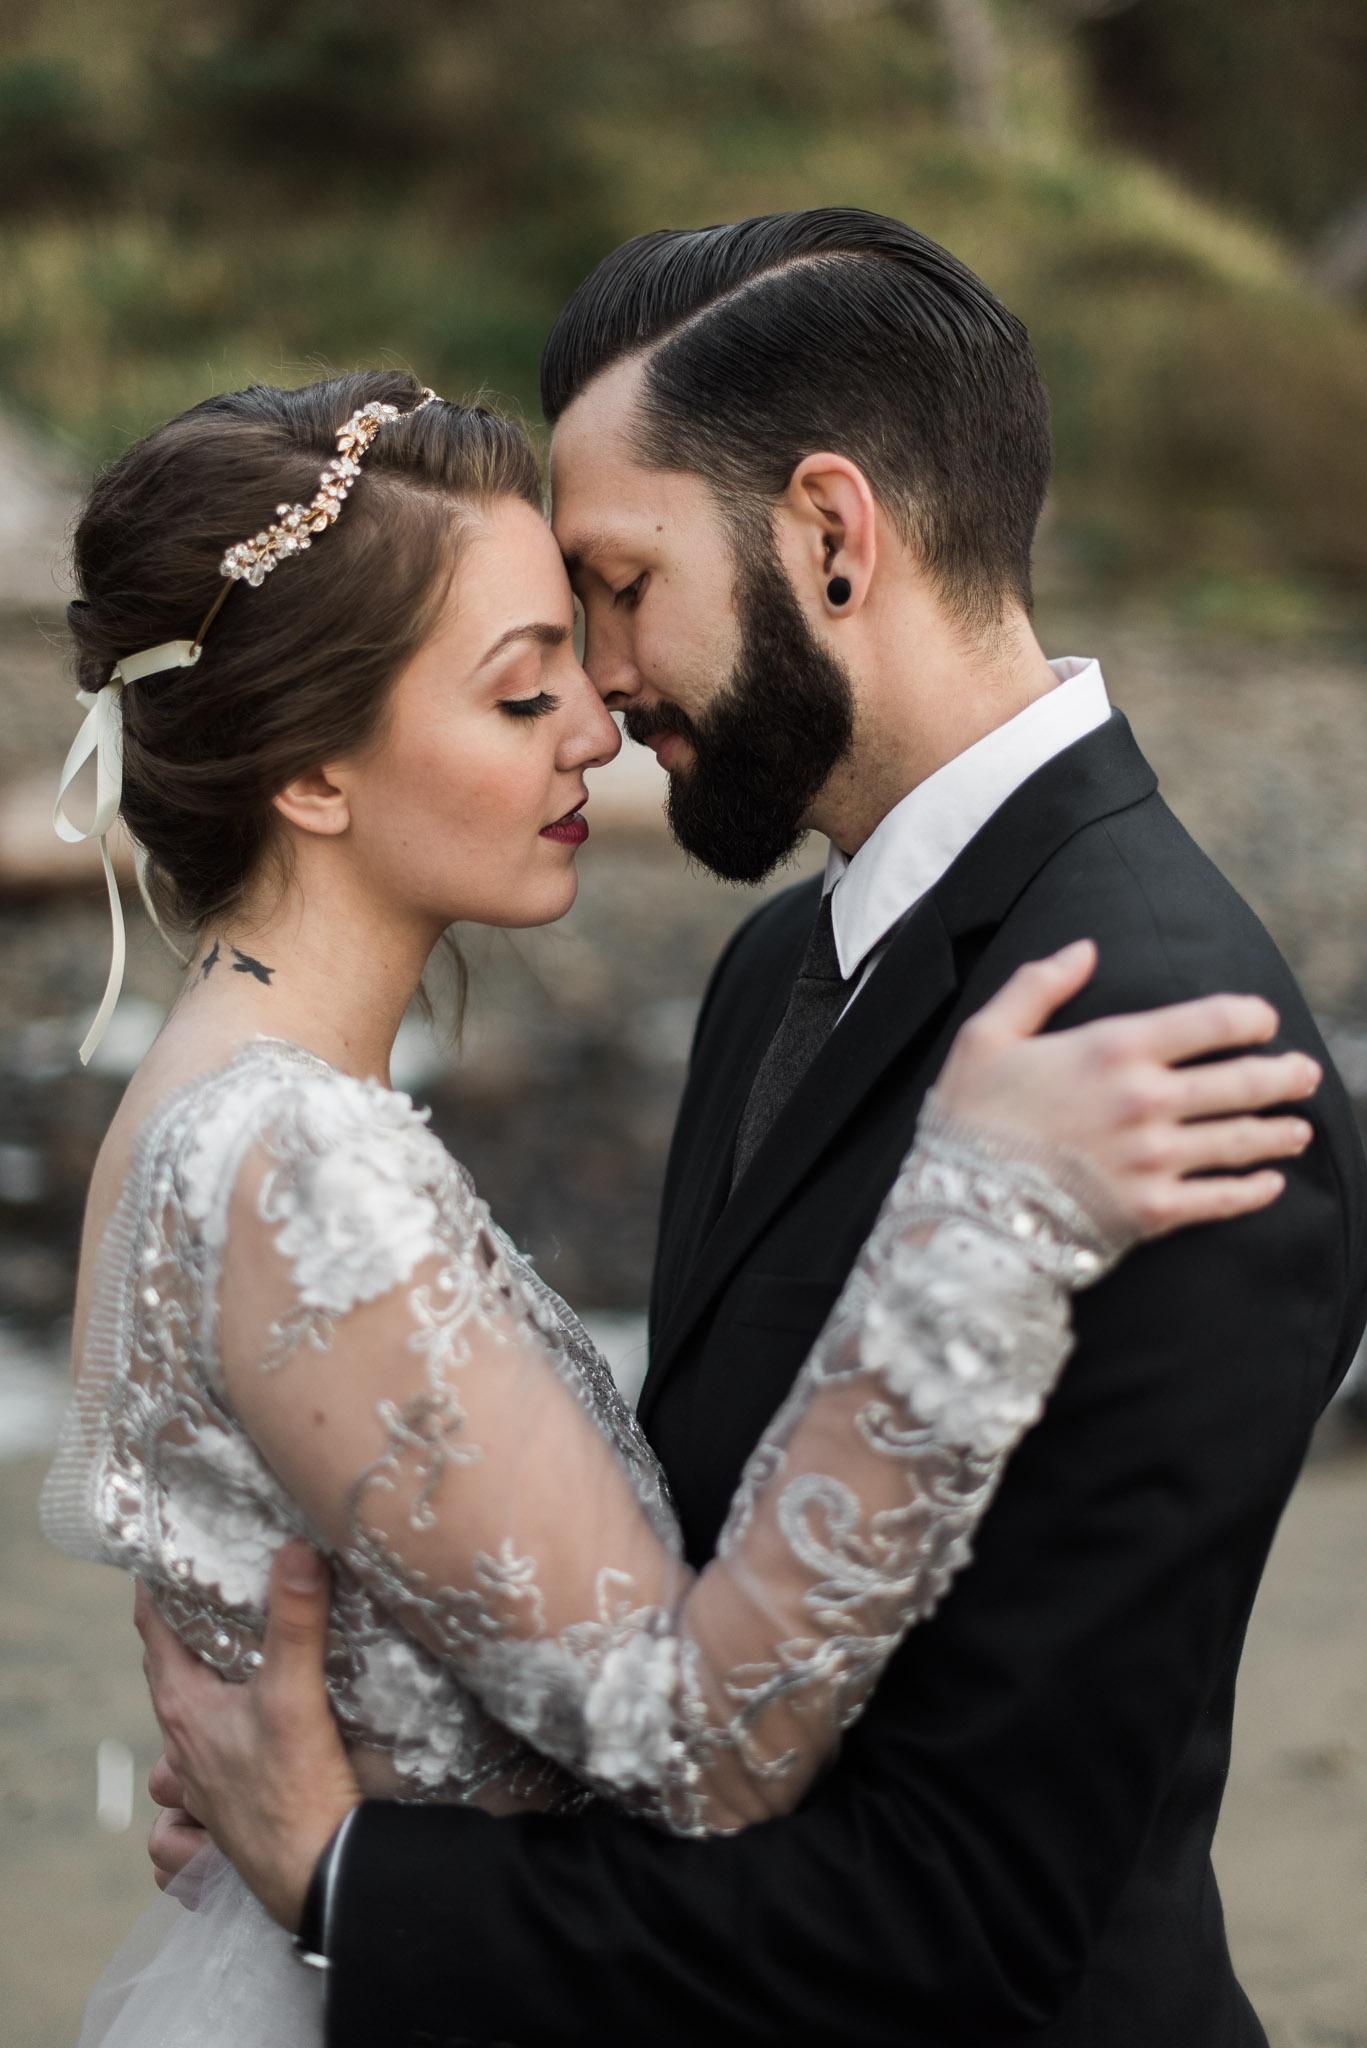 Hug-point-oregon-elopement-engagement-beach-photographer-4